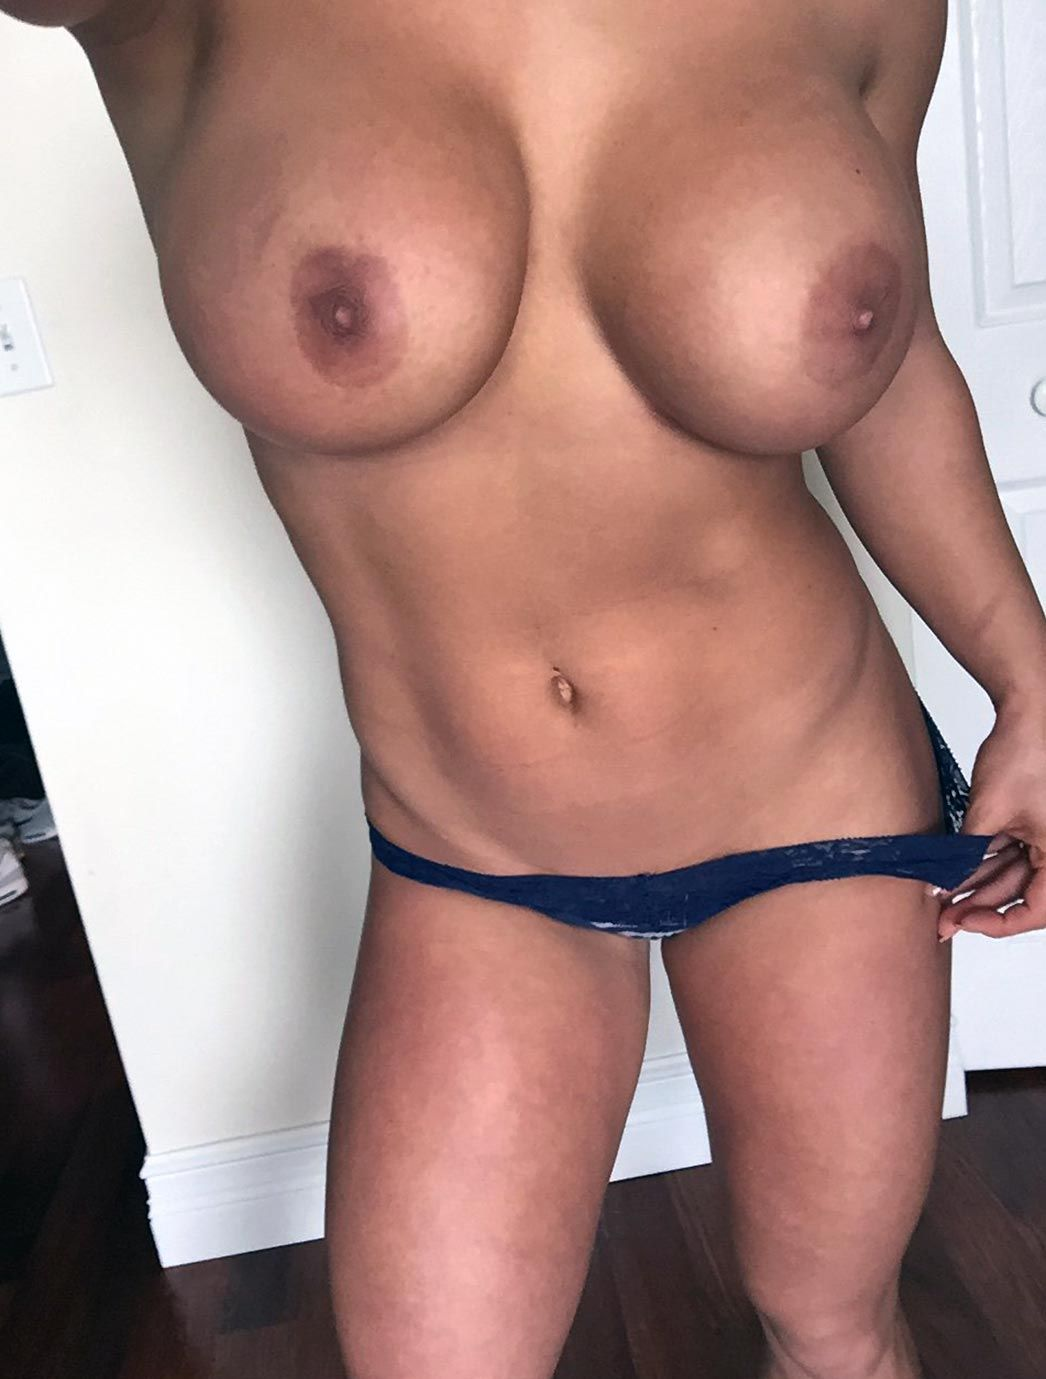 Celeste Bonin Nude Leaked The Fappening & Sexy 0163